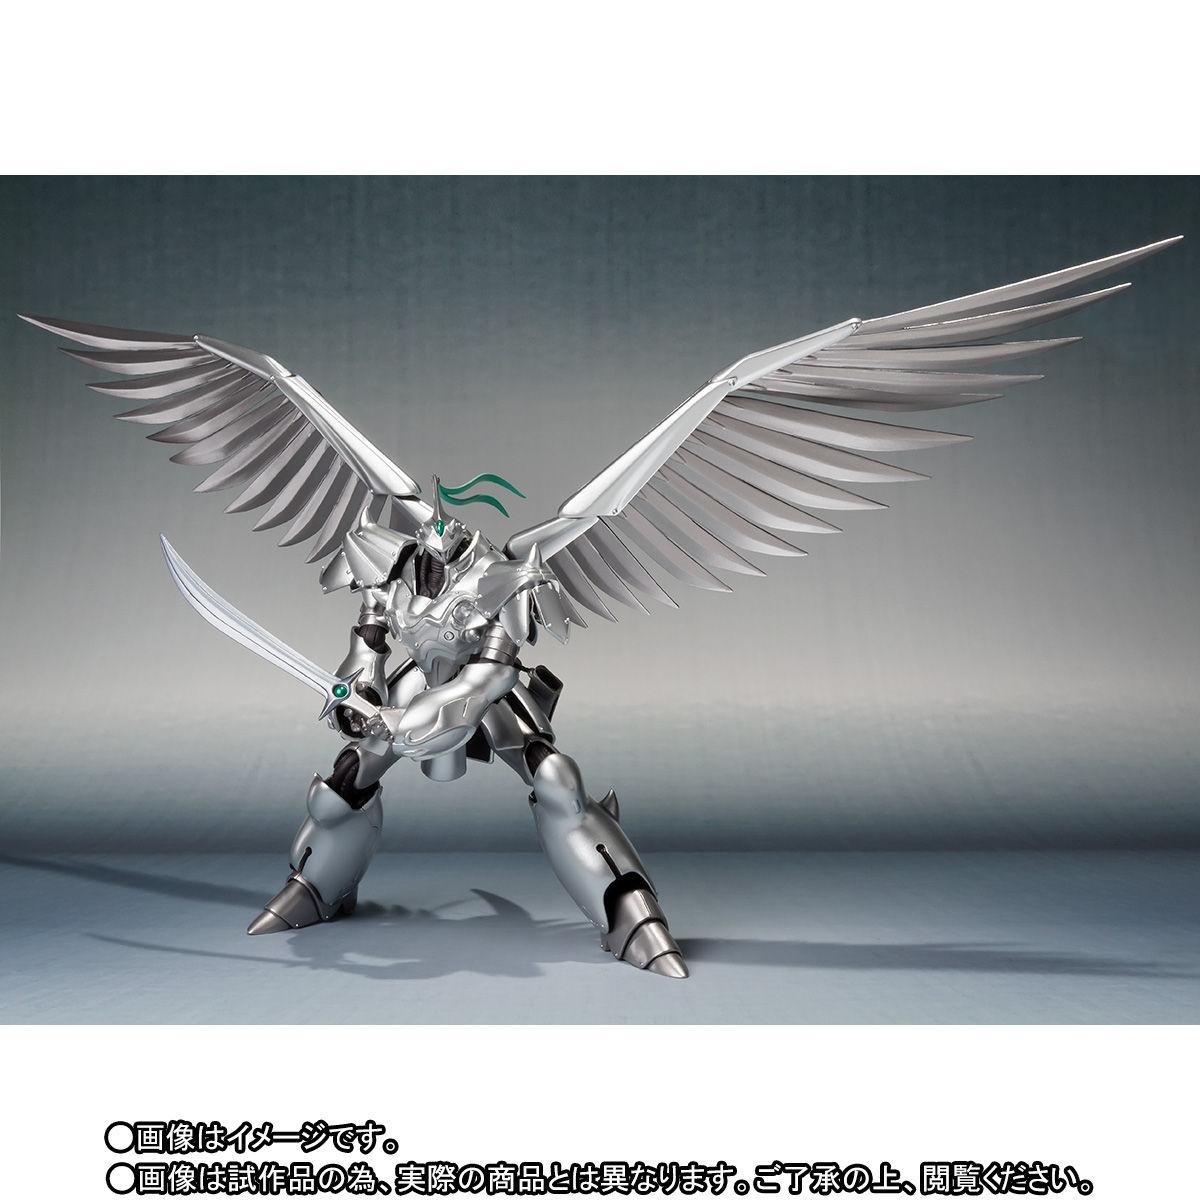 ROBOT魂〈SIDE PB〉『飛甲兵』機甲界ガリアン 鉄の紋章 可動フィギュア-004